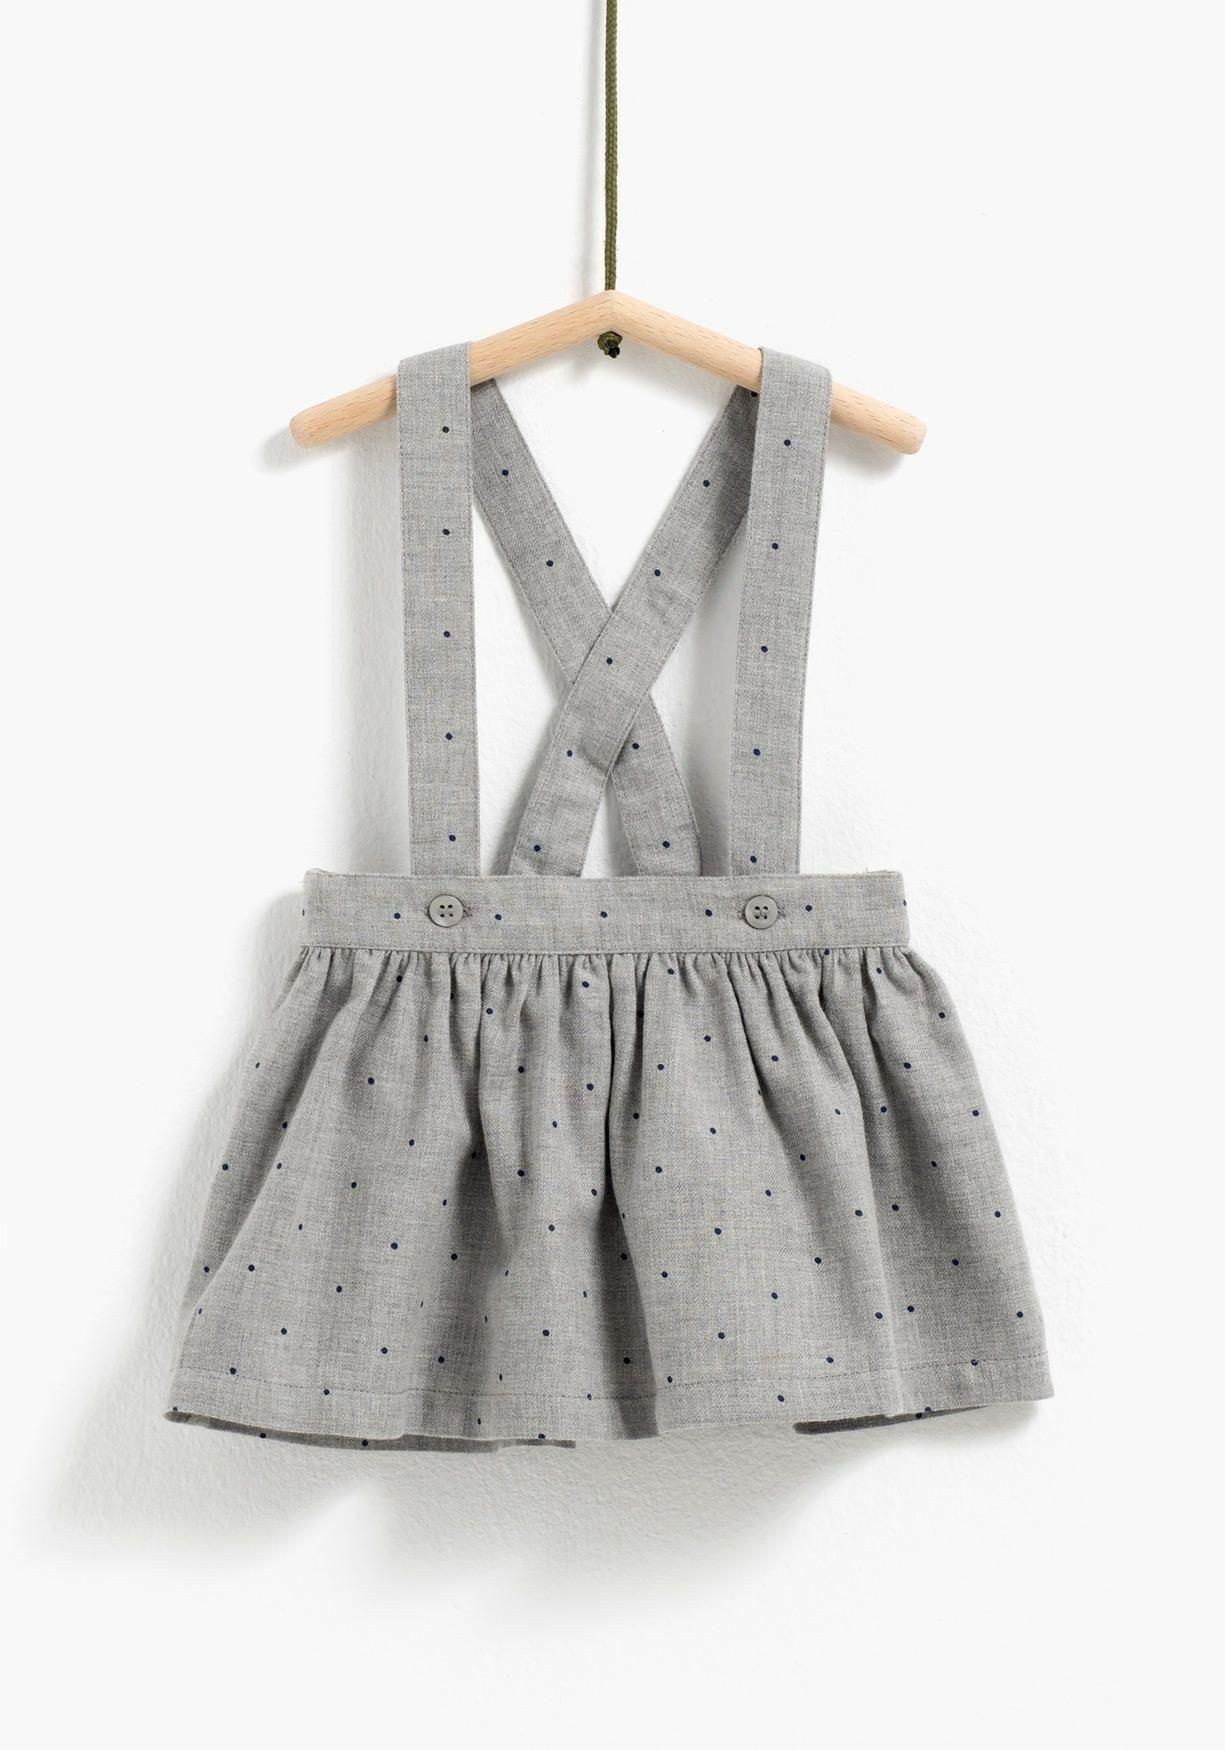 falda con tirantes | Faldas niña | Pinterest | Tirantes, Falda y ...